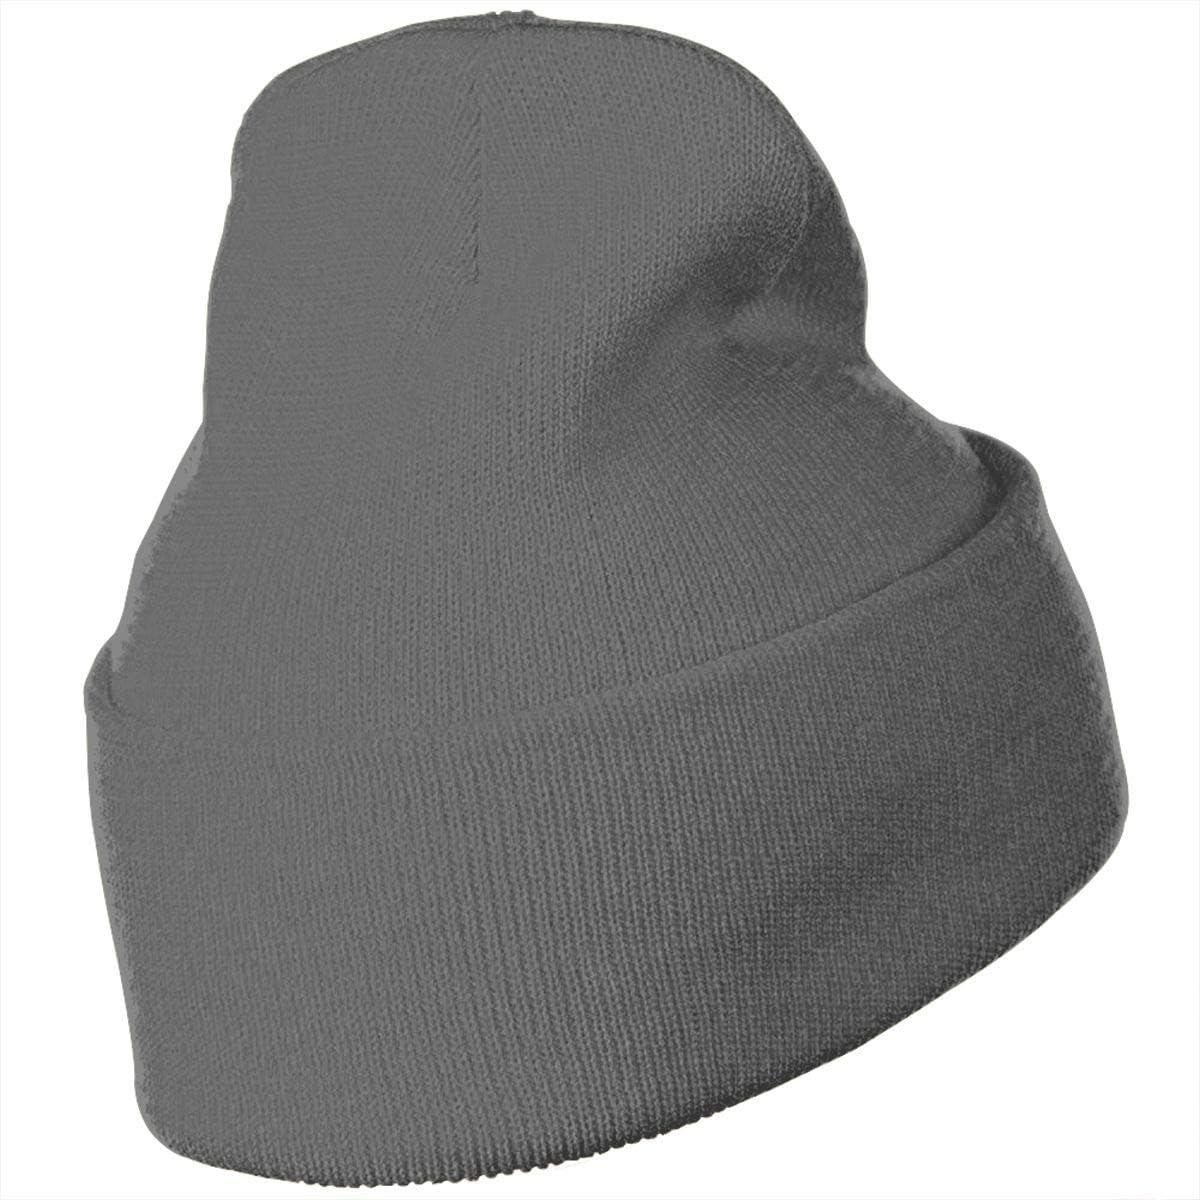 Oopp Jfhg Merry Christmas Periodic Table Wool Cap Skull Hat Unisex Winter